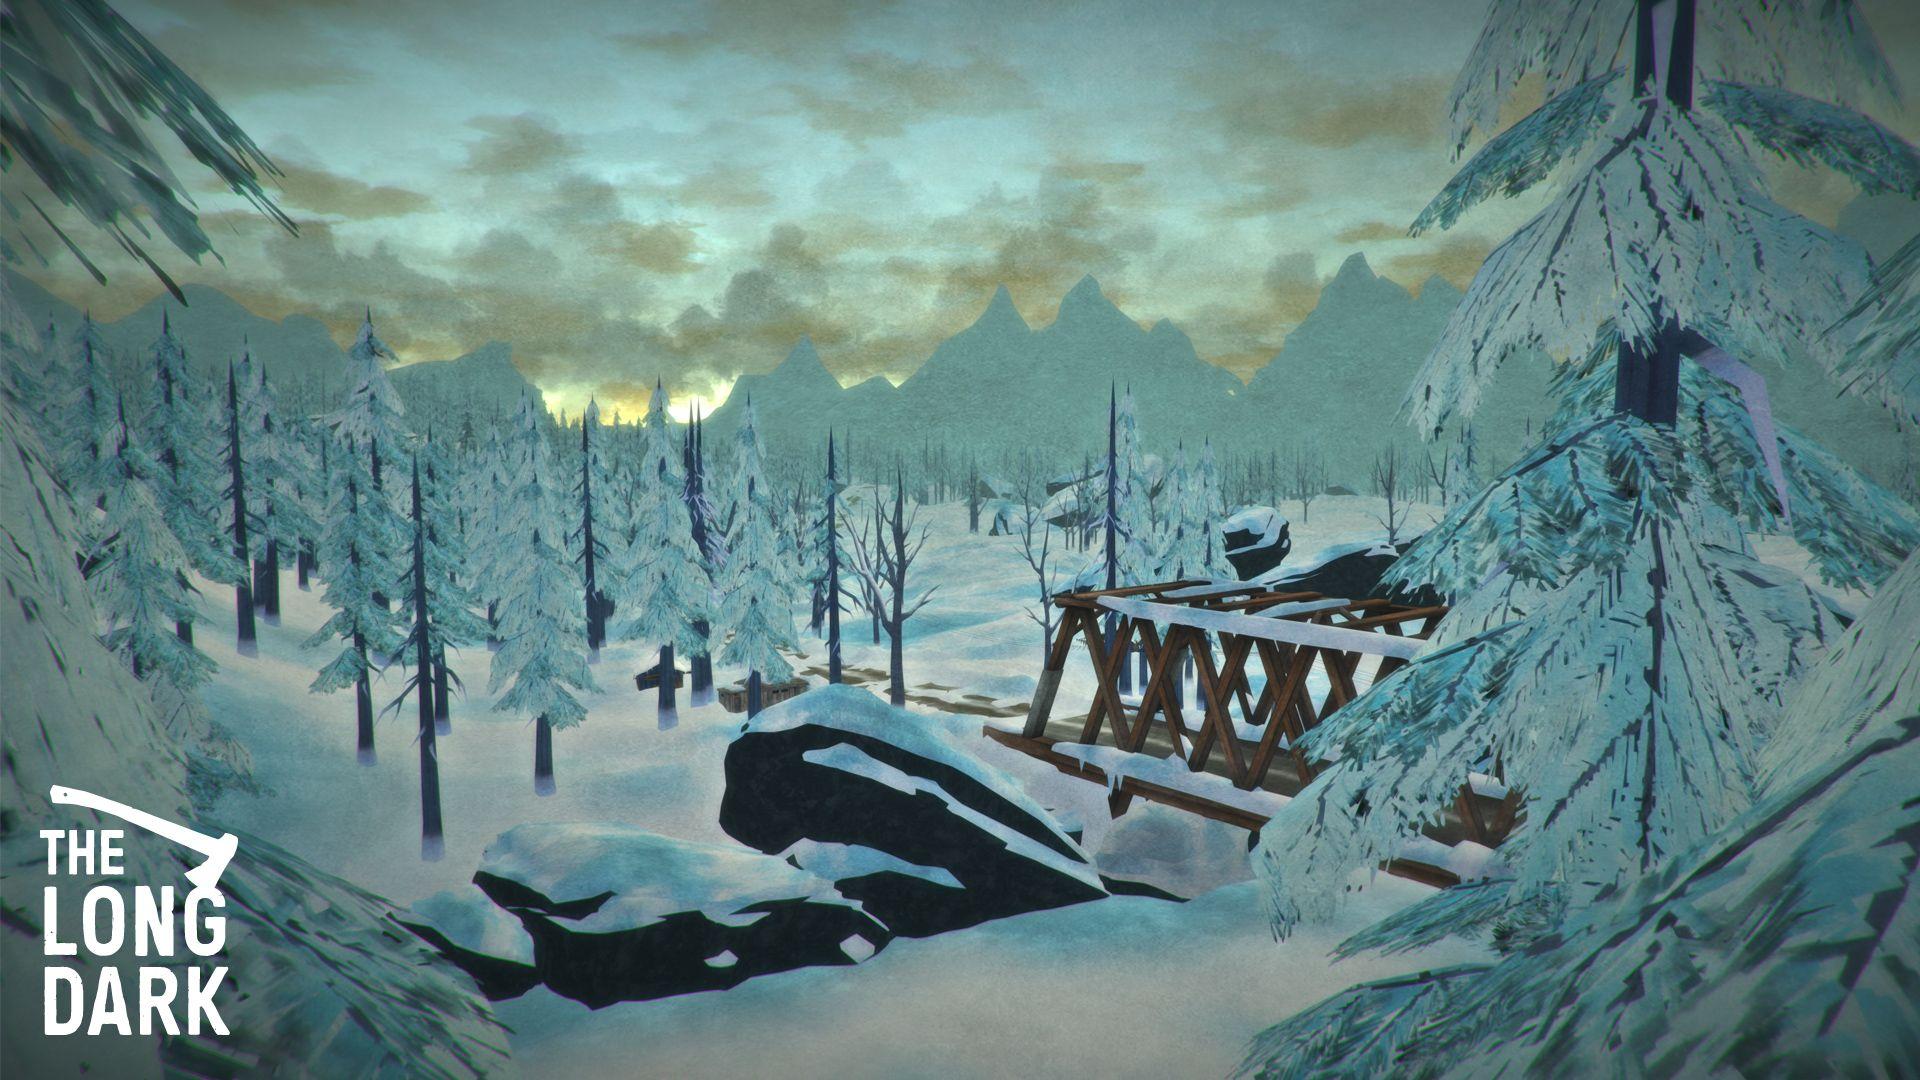 The Longg Dark  Hinterland Game World Map  The Long Dark